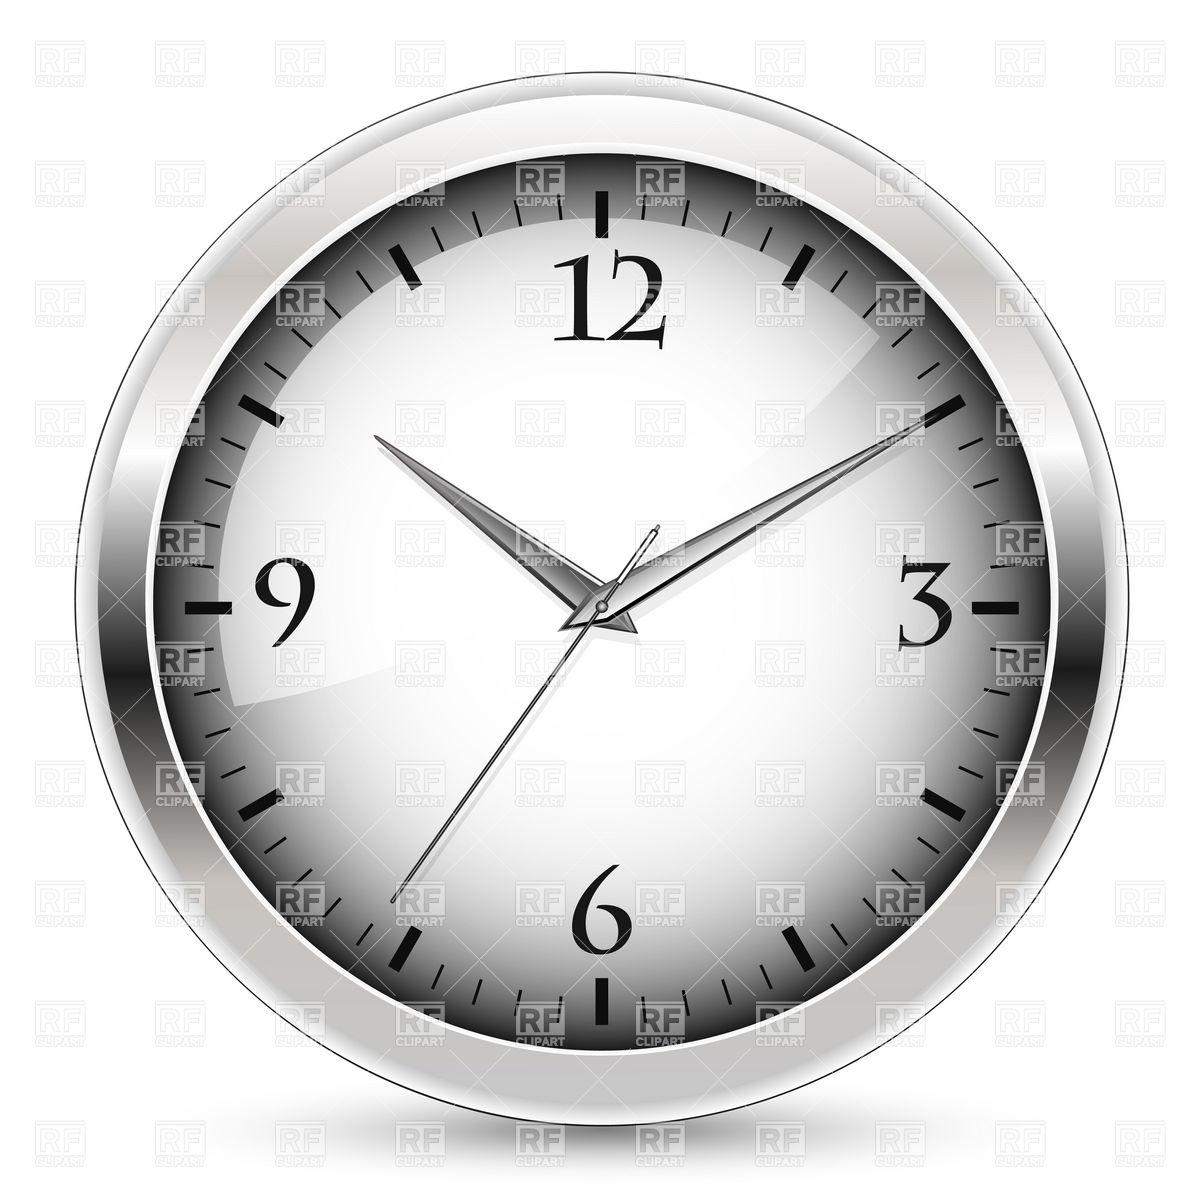 1200x1200 Office wall clock Royalty Free Vector Clip Art Image